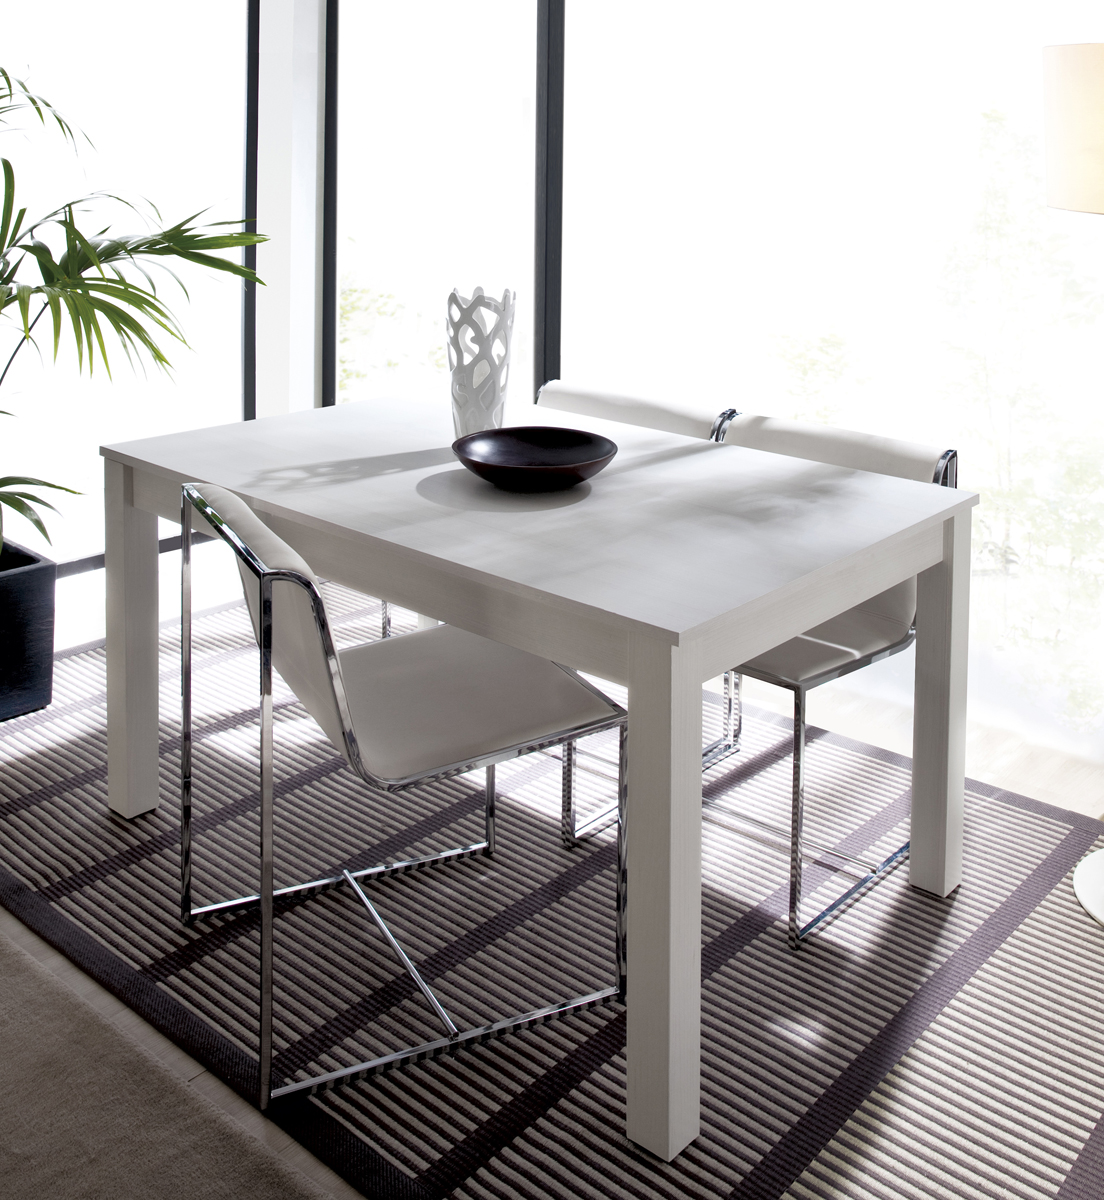 mesas-sillas-003